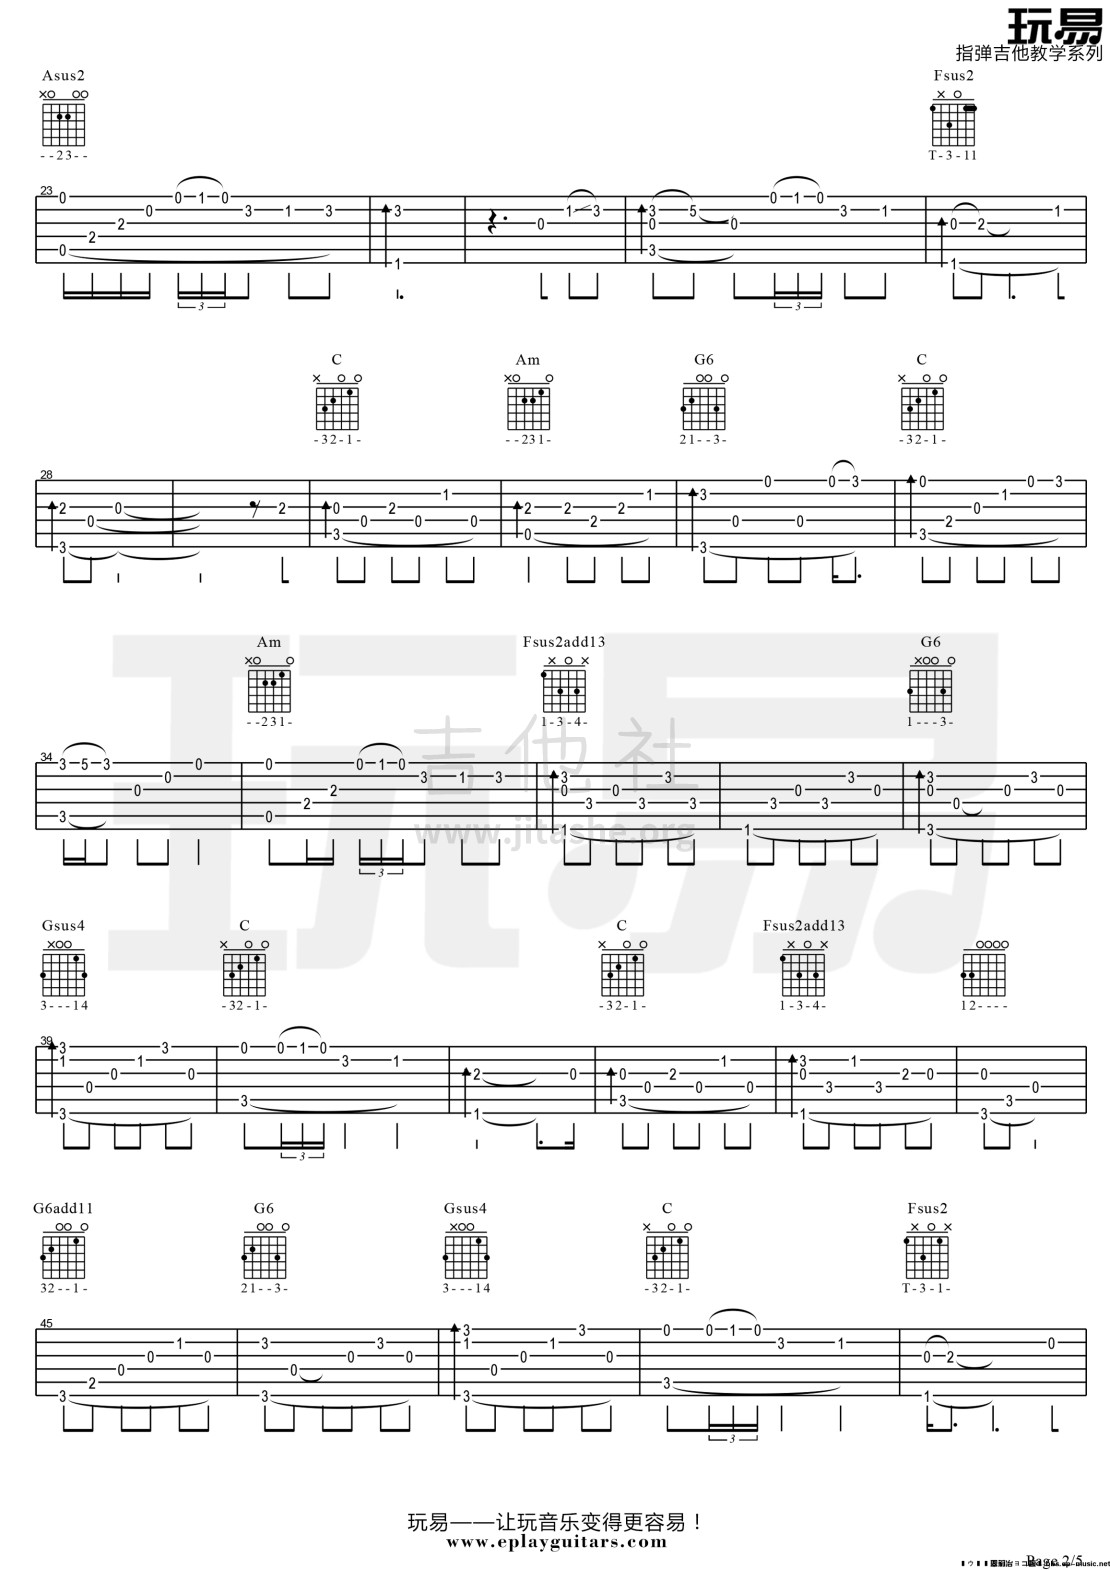 The Immigrant(玩易指弹吉他教学系列)吉他谱(图片谱,指弹,教学,玩易指弹教学)_Joanie Madden(乔妮·梅登)_The  lmmigrant 2.jpg